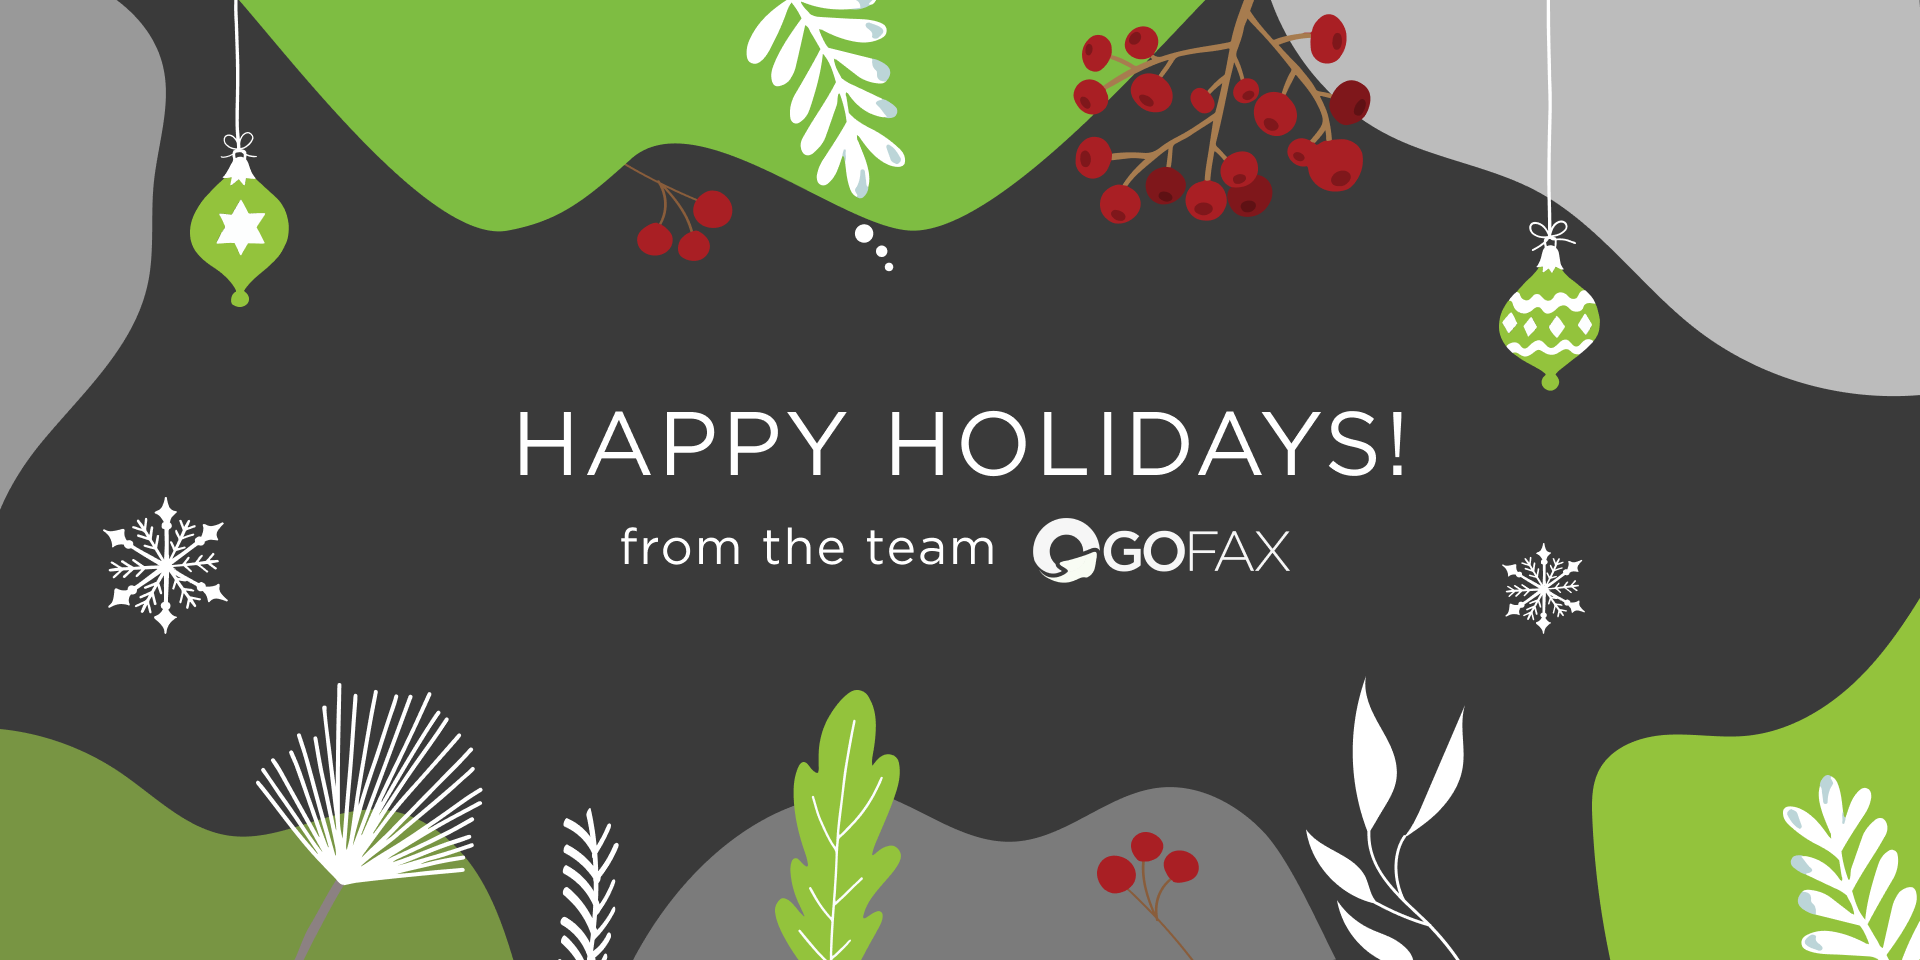 gofax-holiday-embargo-2020